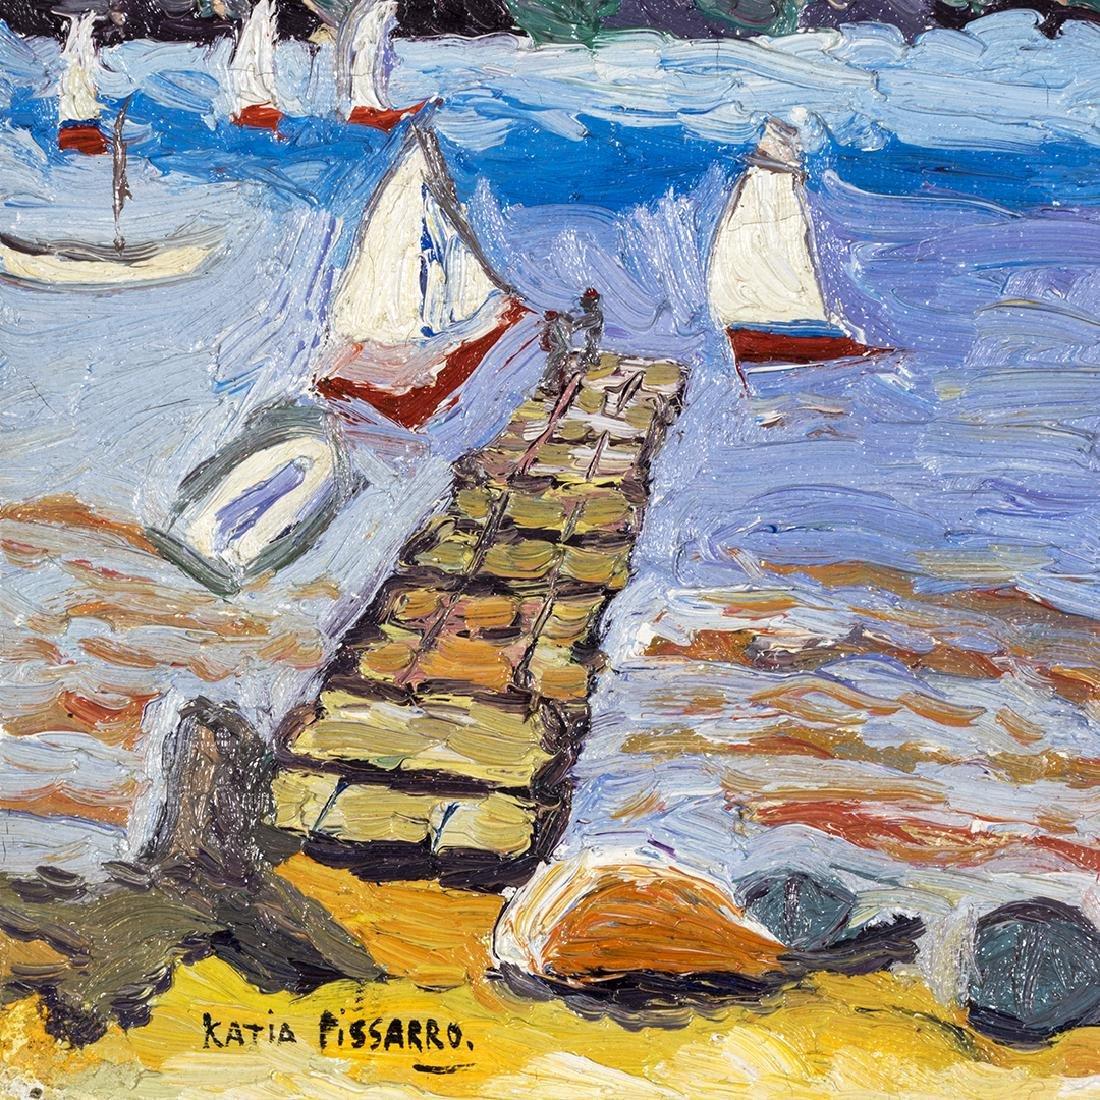 Katia Pissarro St. Halo Oil Painting - 2